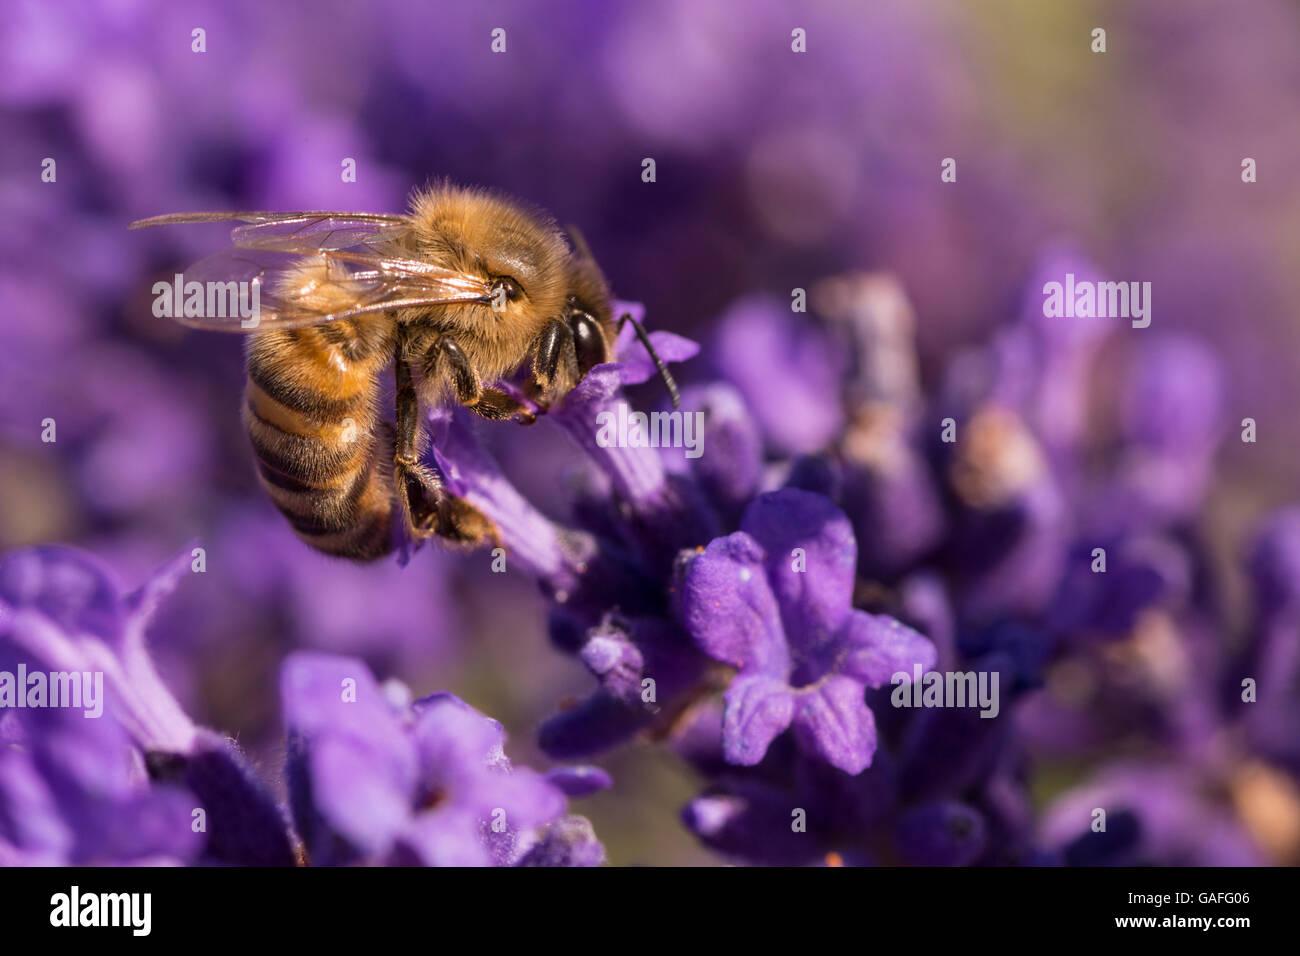 Biene auf Lavendel Stockbild